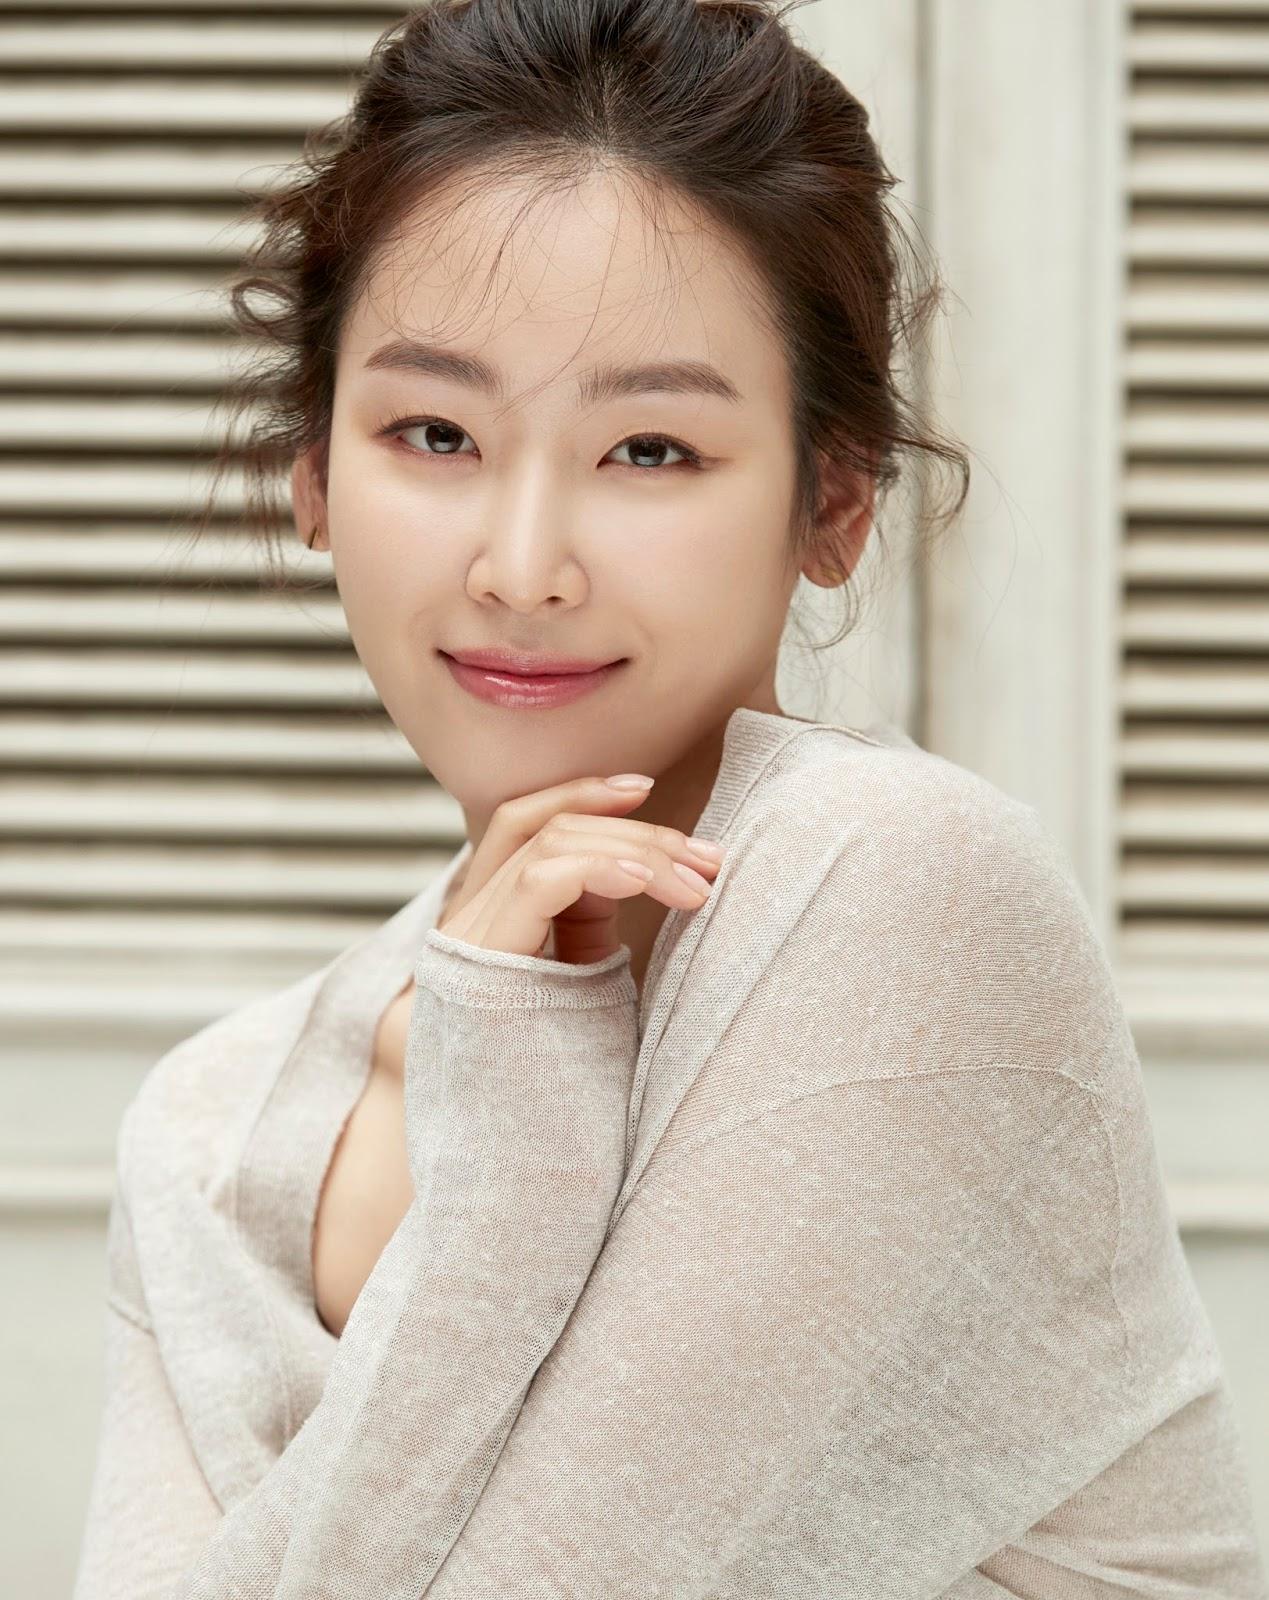 [Actor Spotlight] Seo Hyun-jin